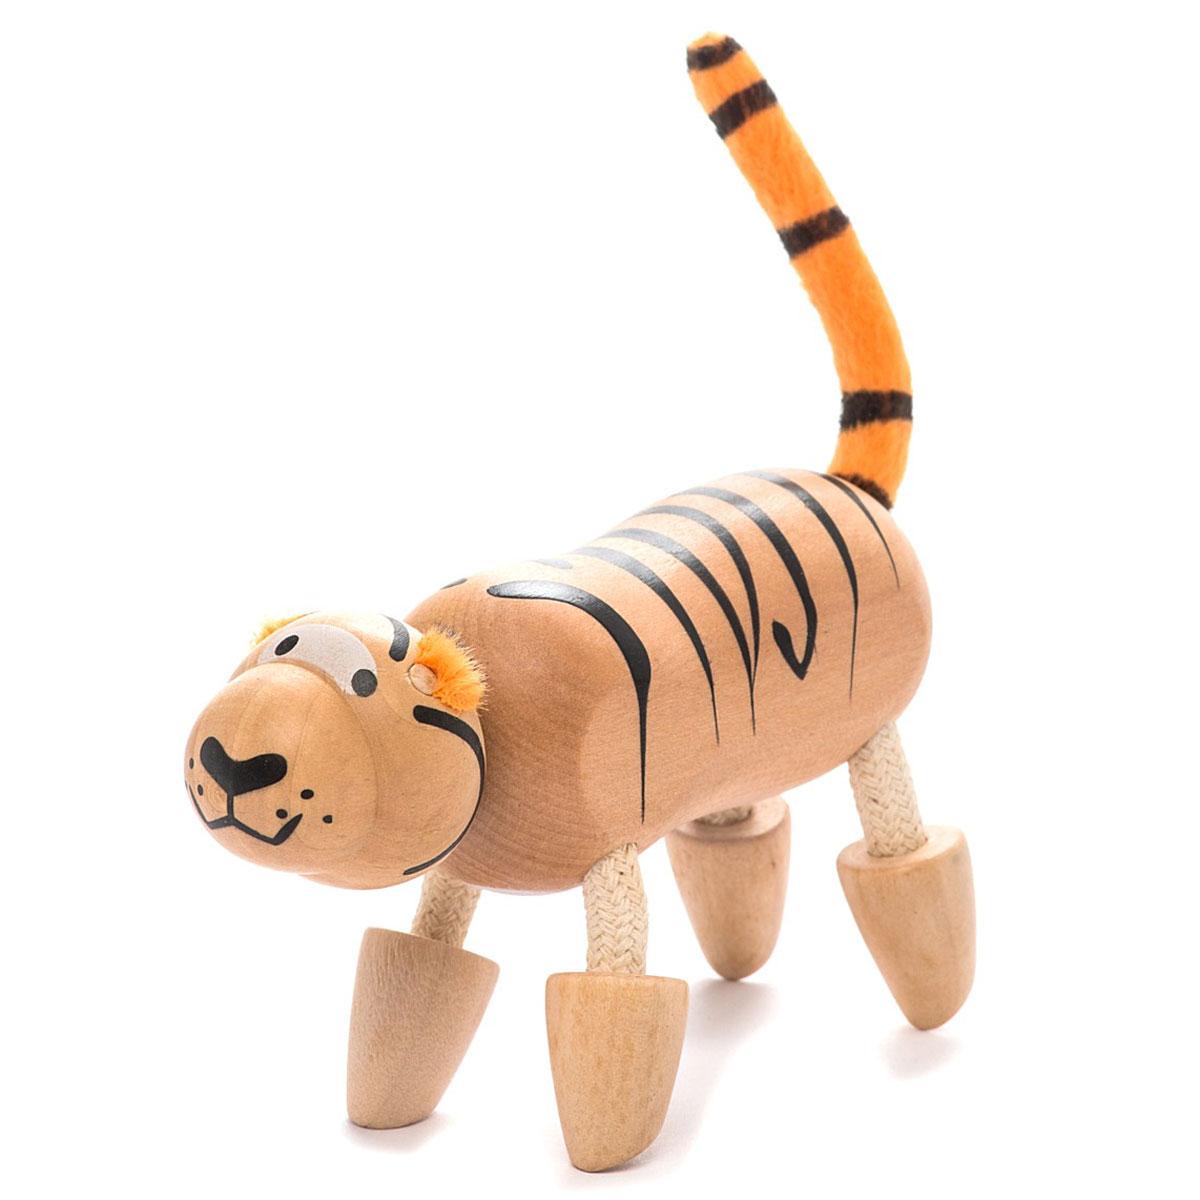 AnaMalz Фигурка деревянная Тигренок фигурки игрушки anamalz касатик